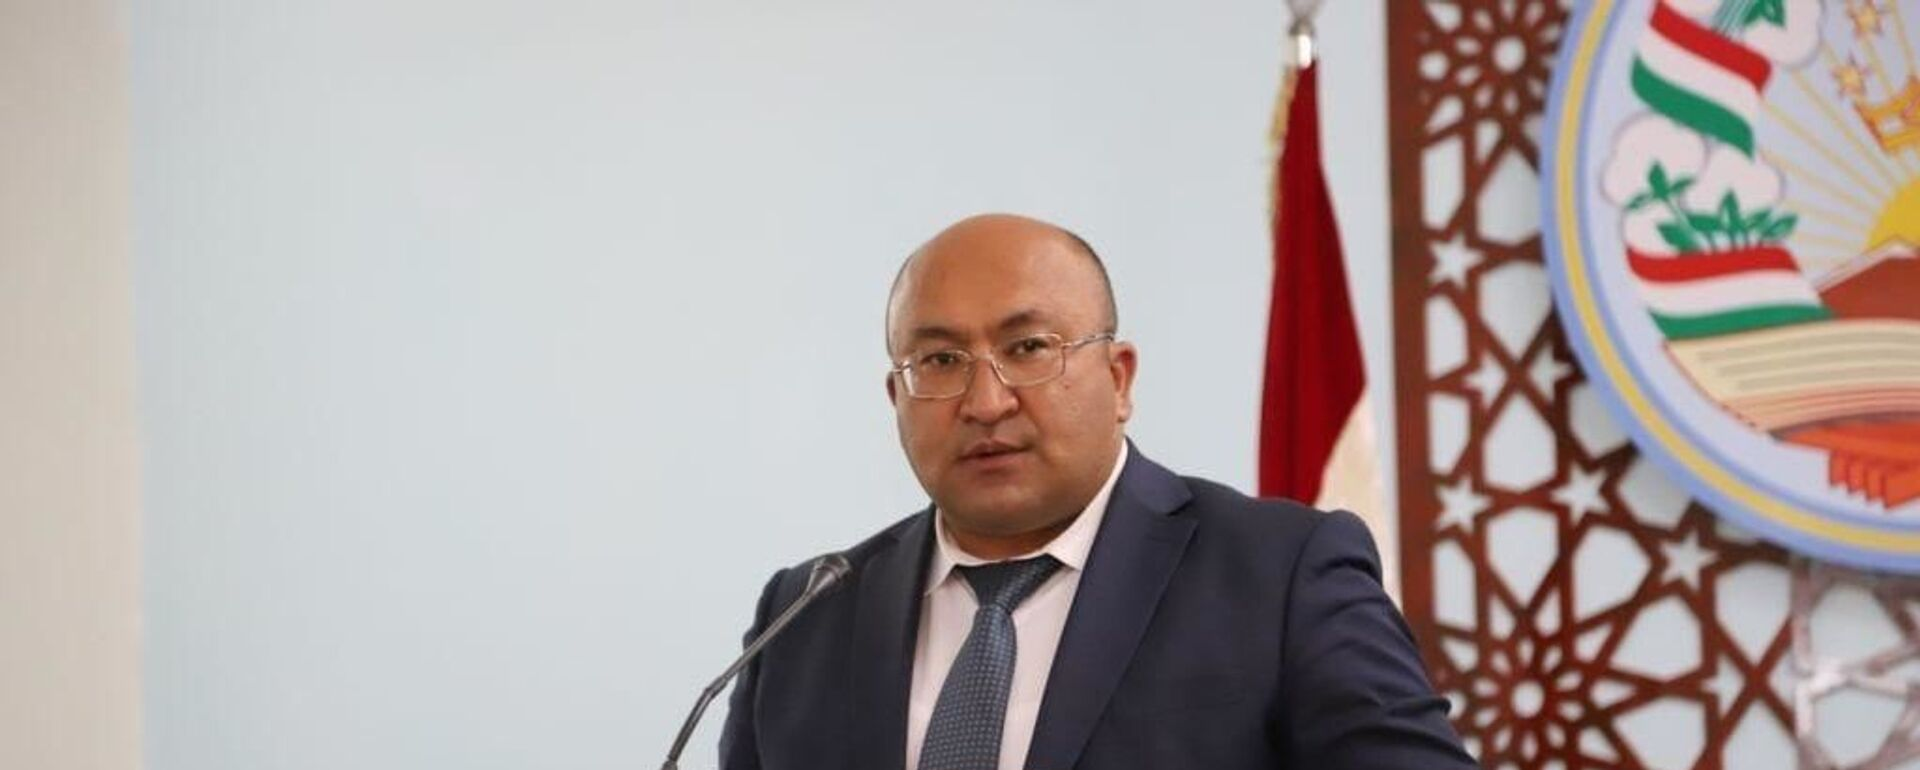 Баховаддин Баходурзода, исполняющий обязанности председателя города Исфара - Sputnik Таджикистан, 1920, 03.05.2021